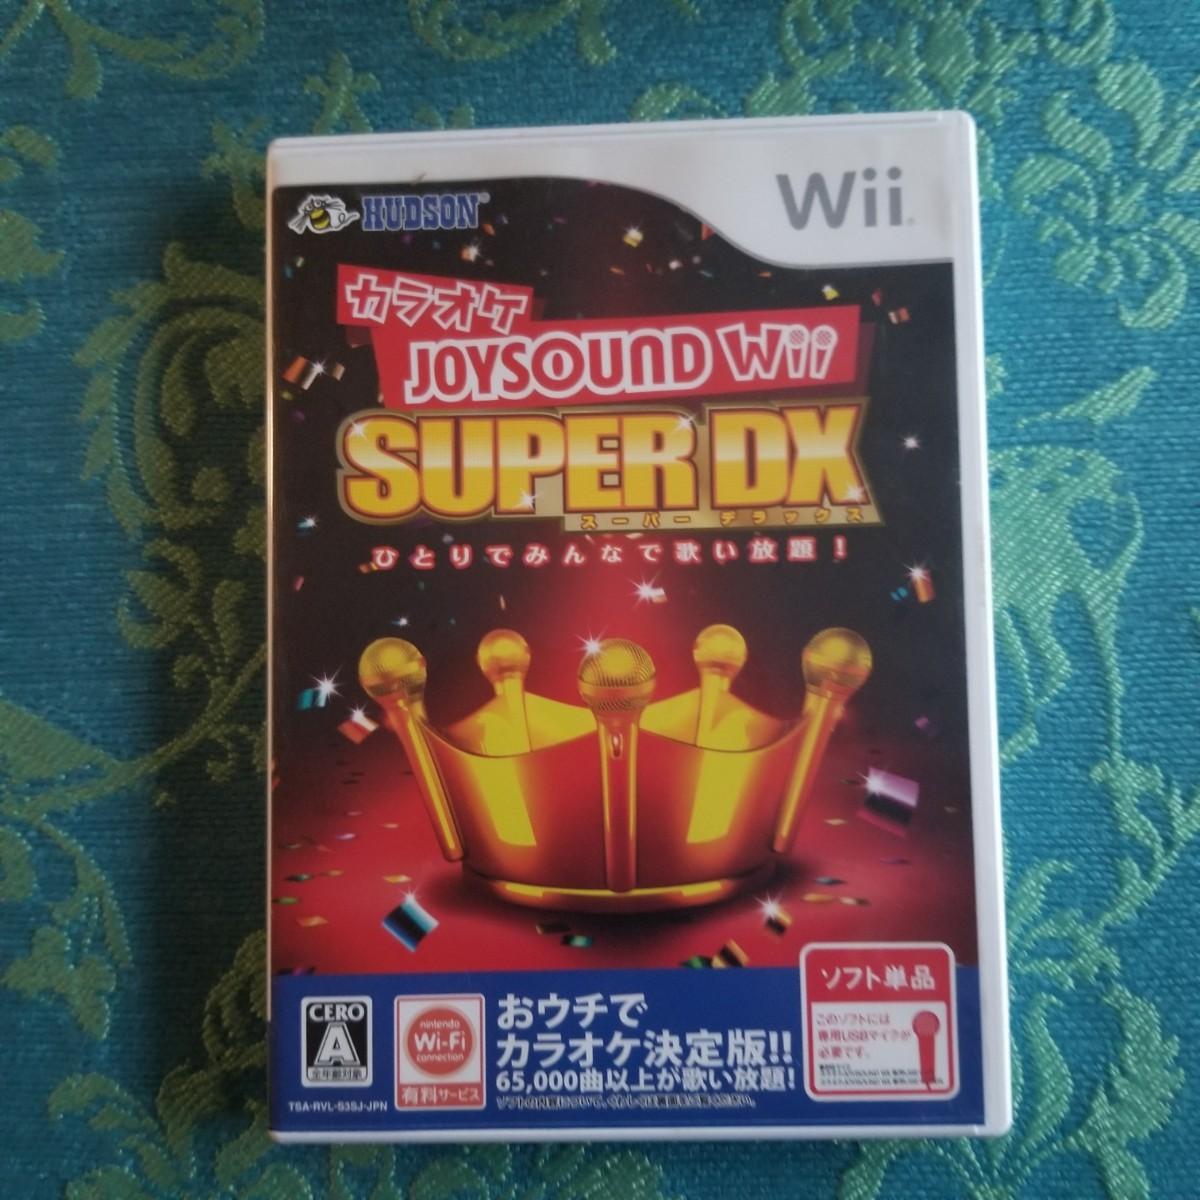 【Wii】カラオケ JOYSOUND SUPER DX ジョイサウンド スーパーデラックス